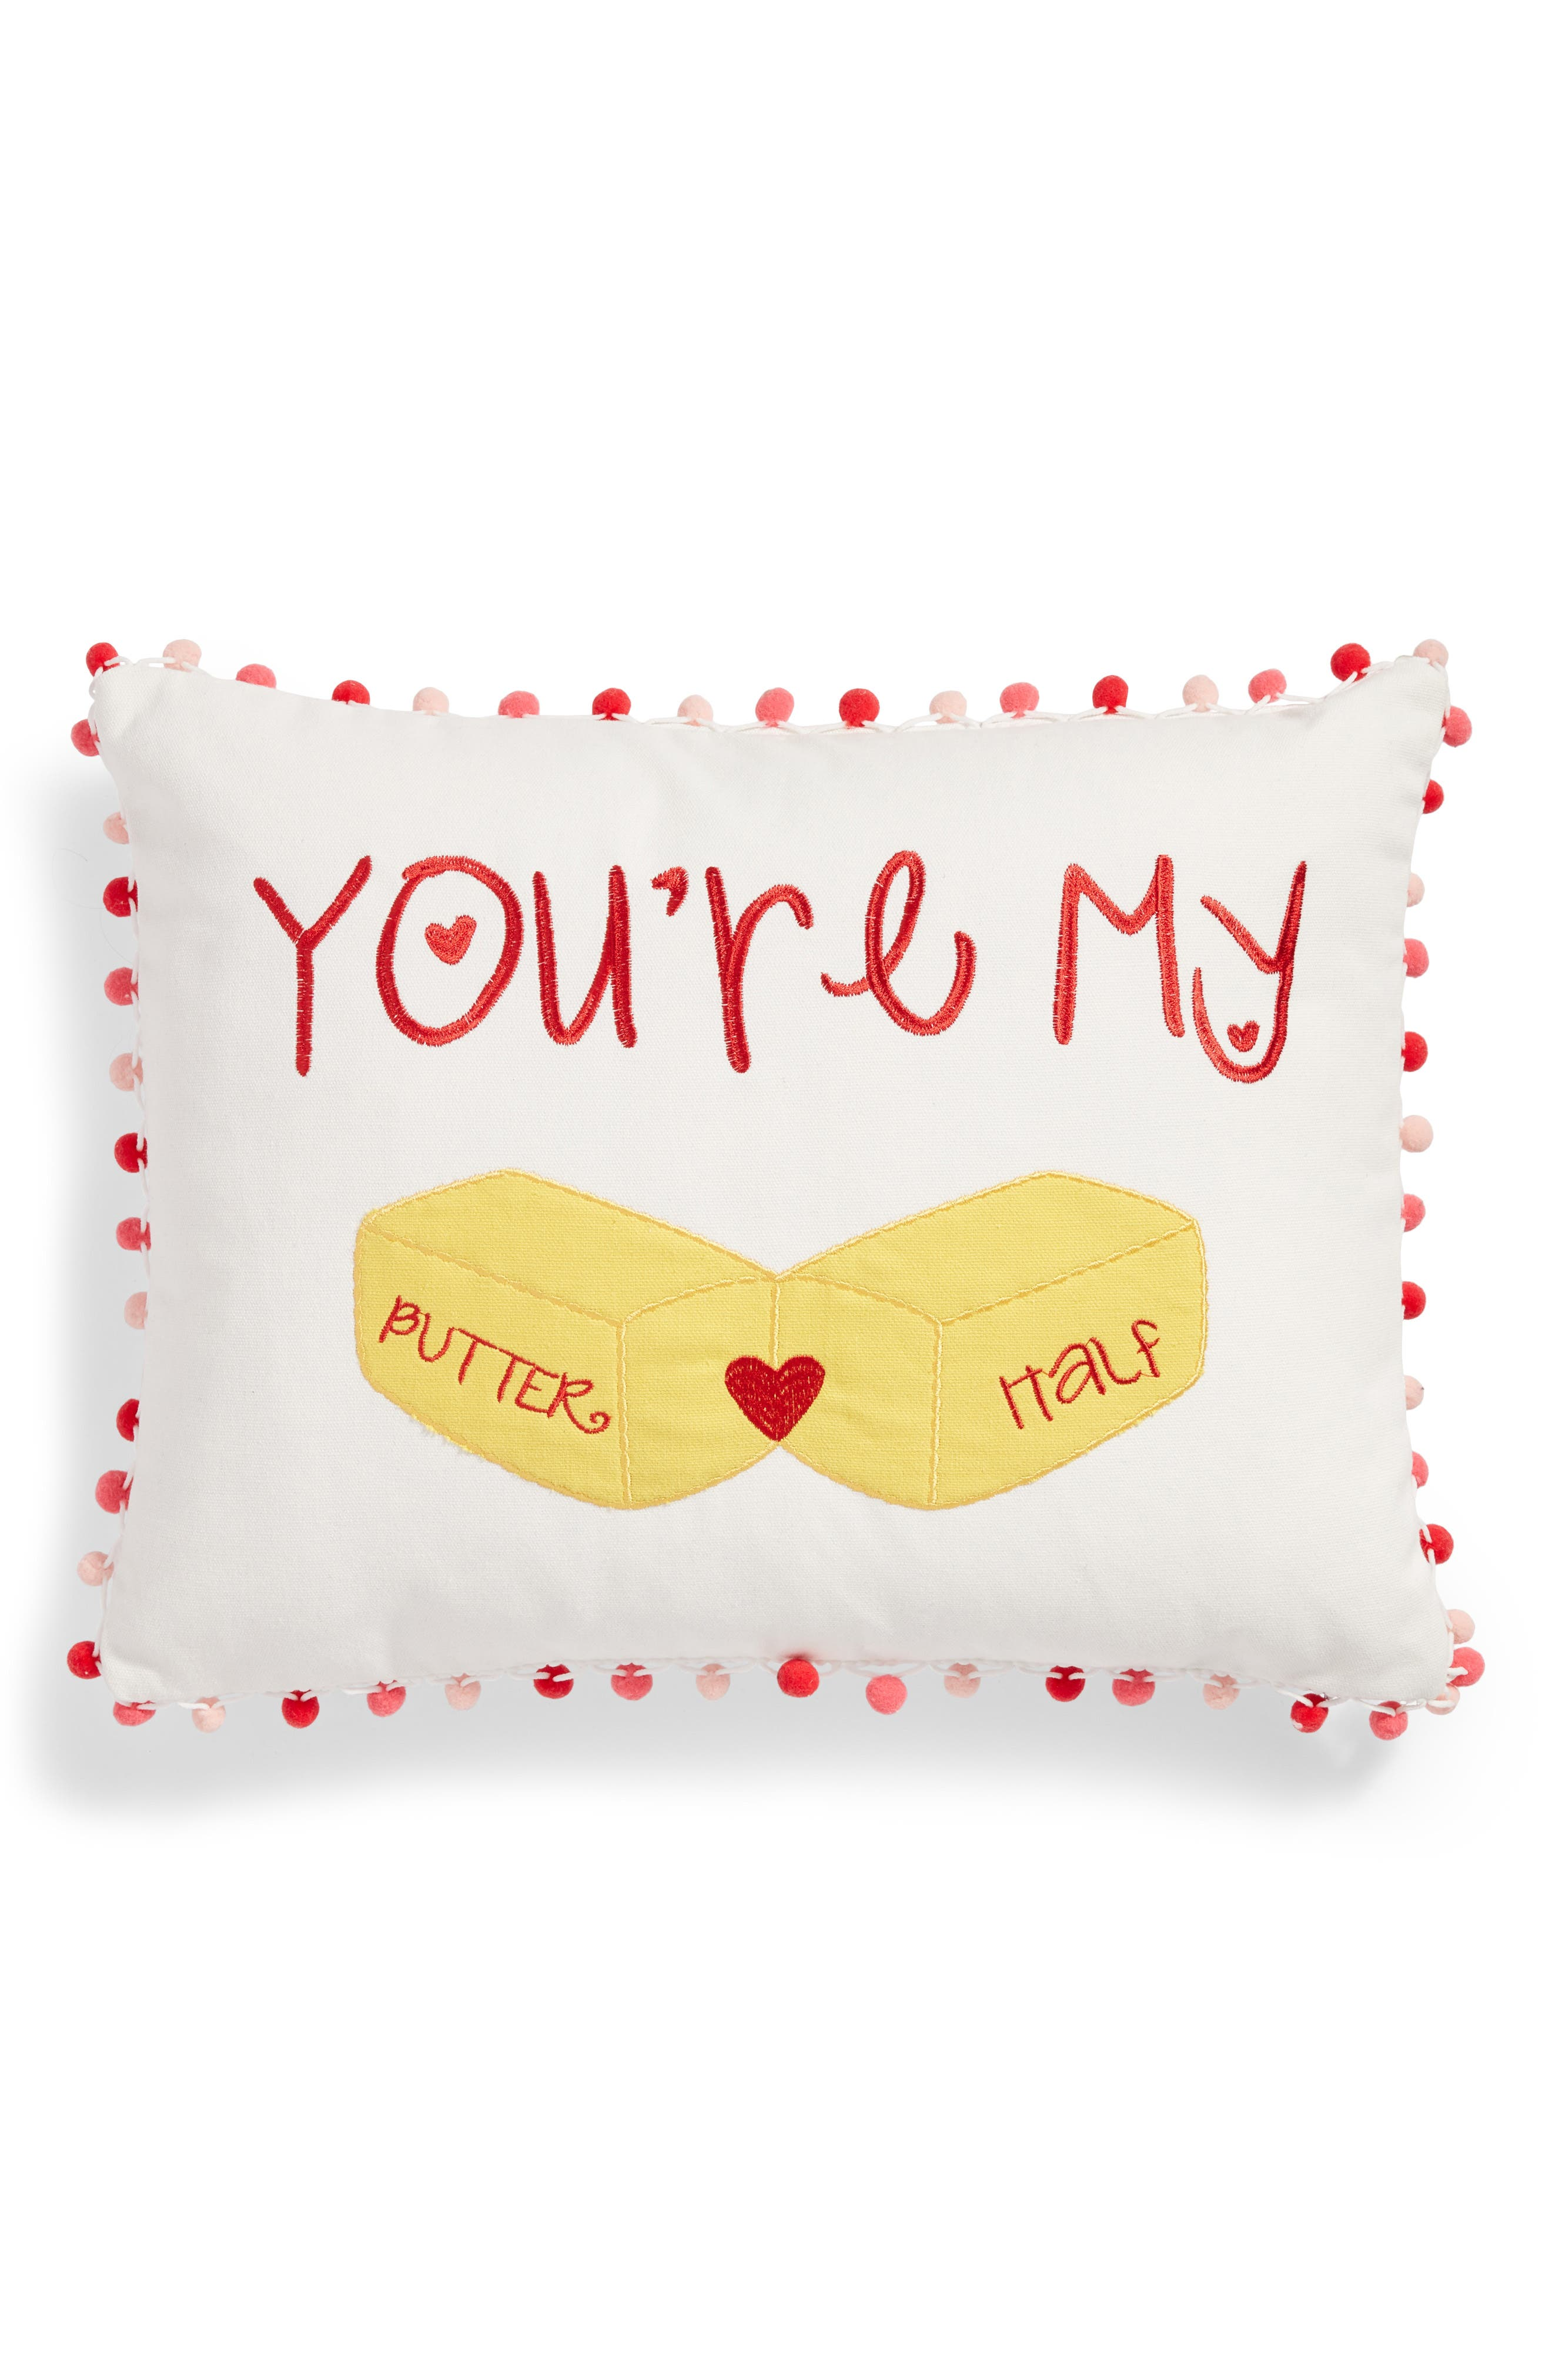 Alternate Image 1 Selected - Levtex Butter Half Accent Pillow